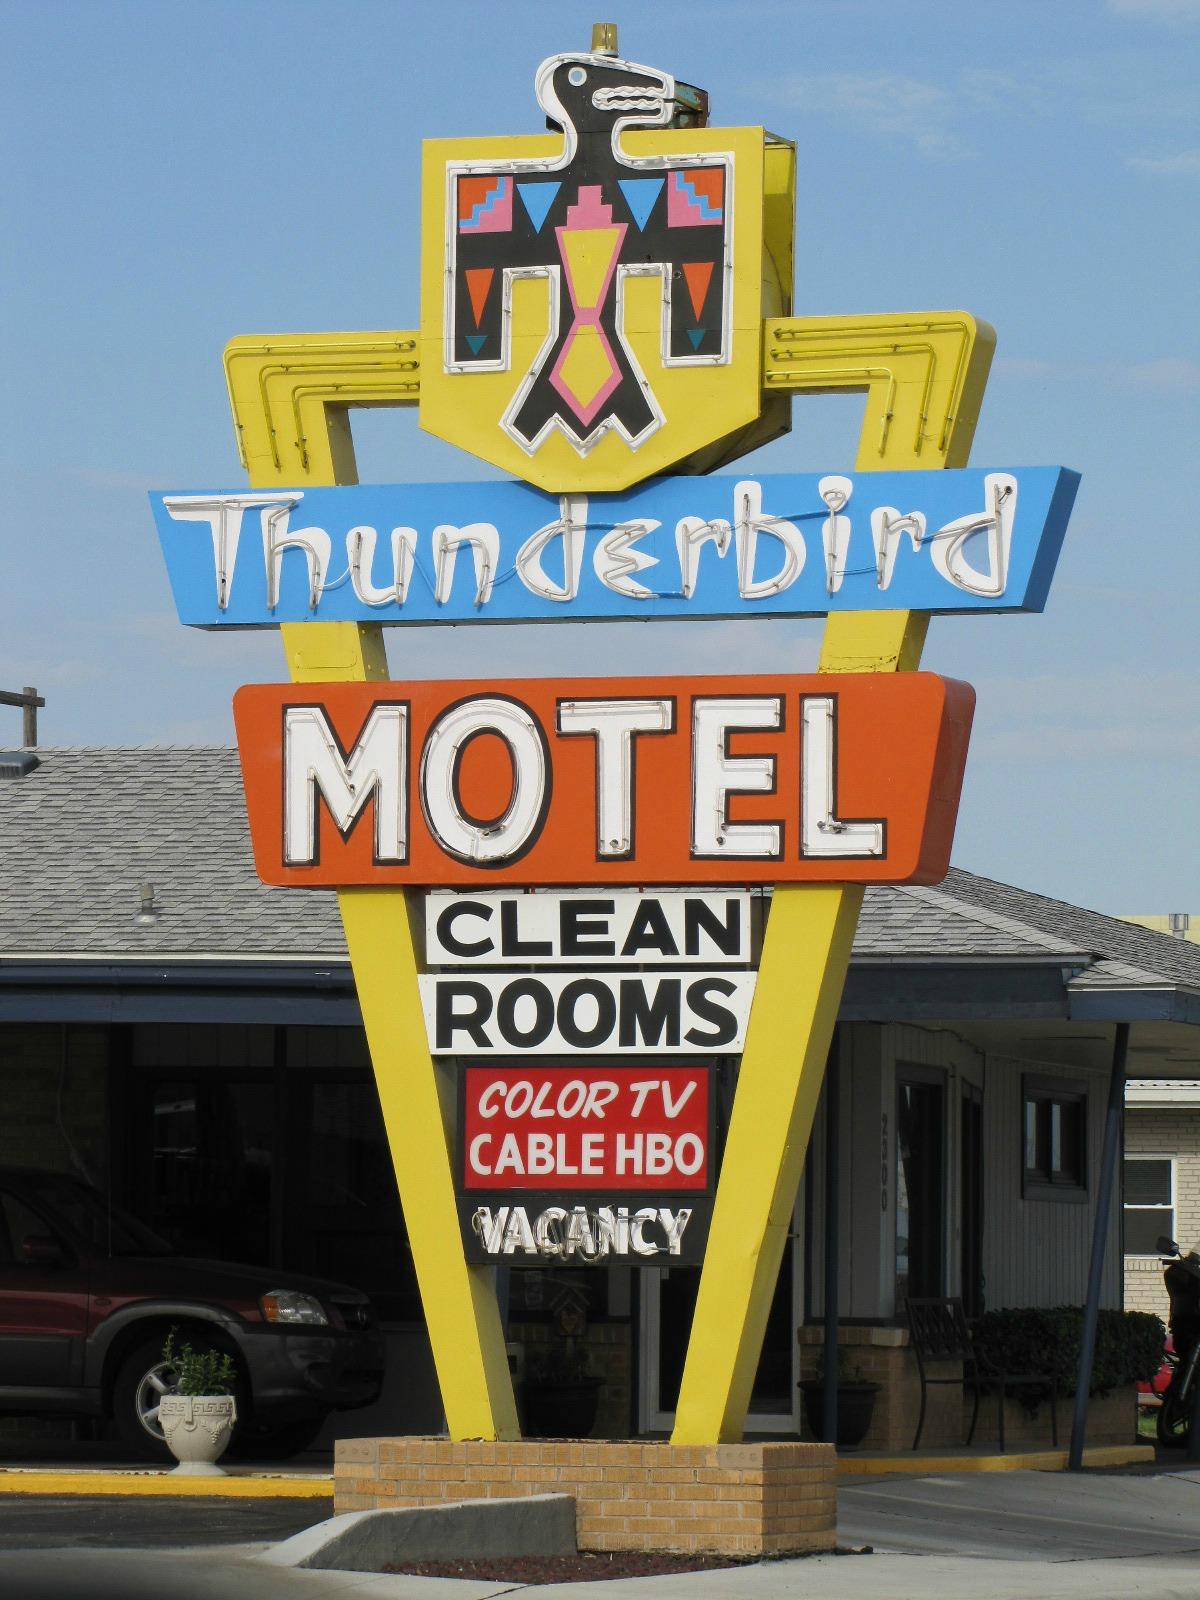 Thunderbird Motel - 2300 West Wyatt Earp Boulevard, Dodge City, Kansas U.S.A. - May 12, 2012